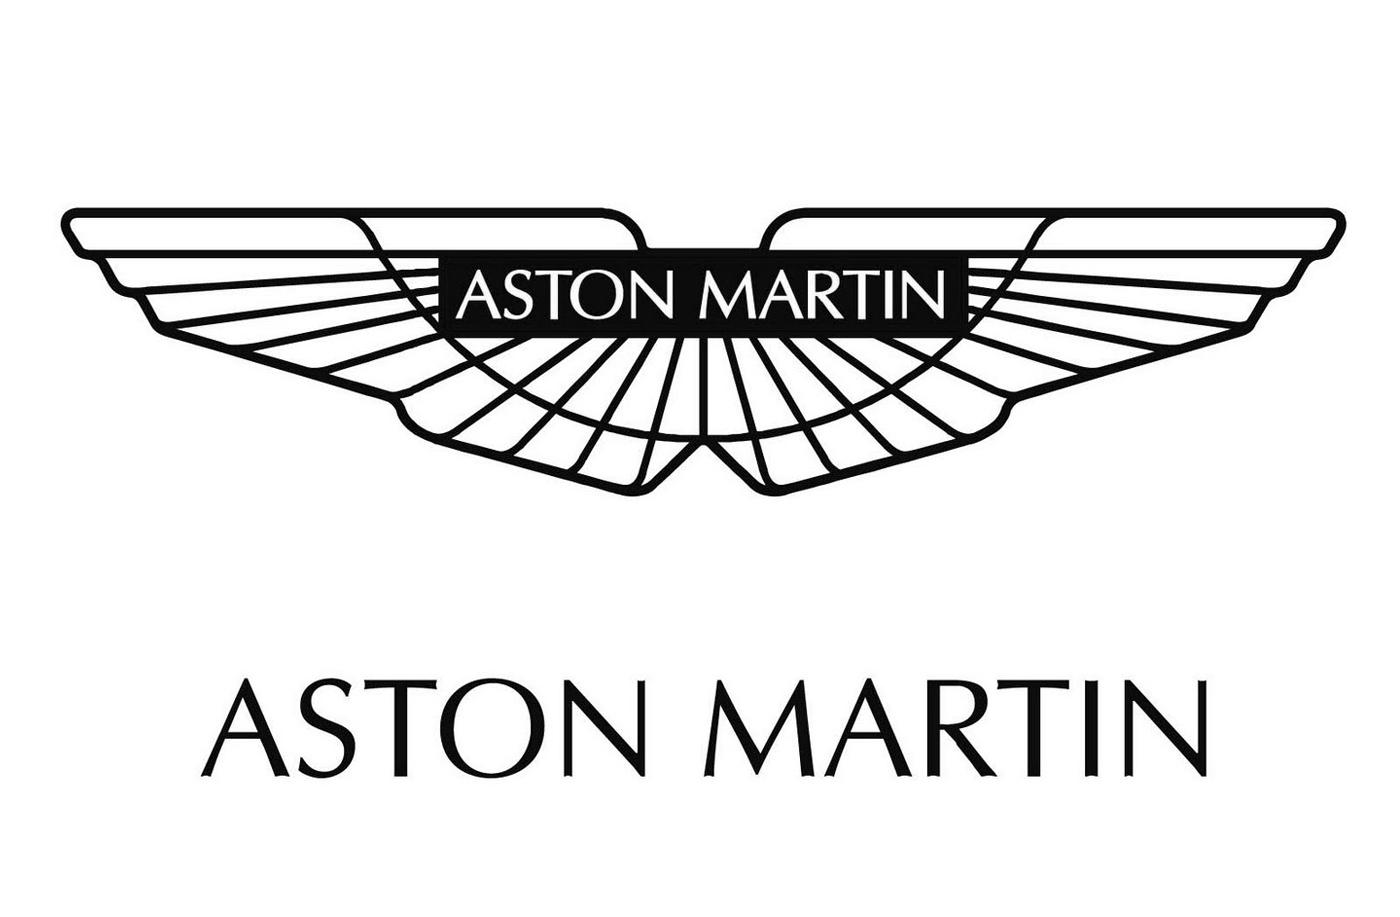 Aston martin bultmönster